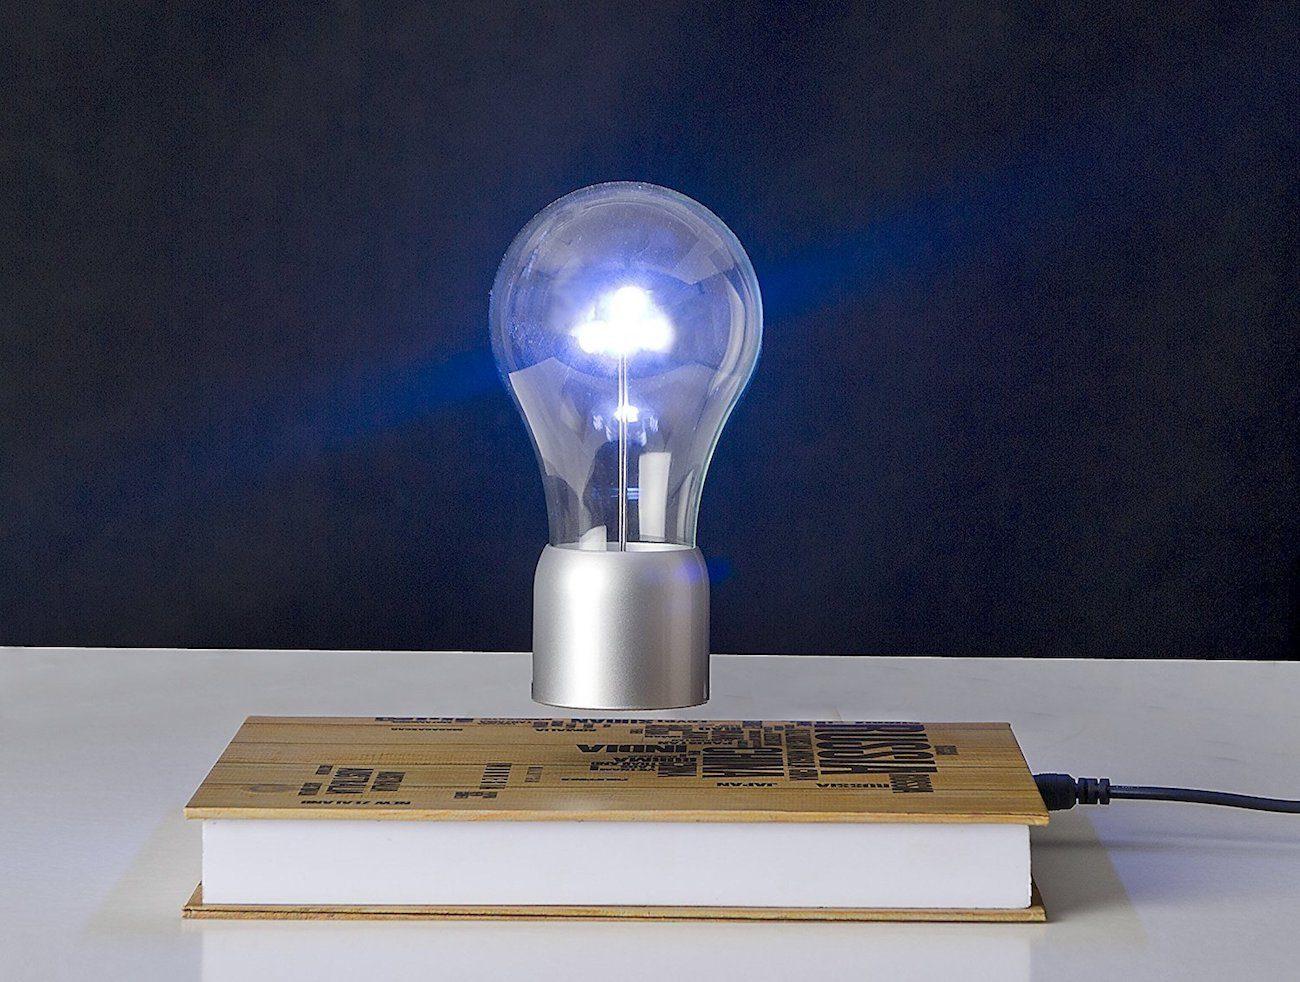 spaceb-levitating-light-bulb-lamp-2